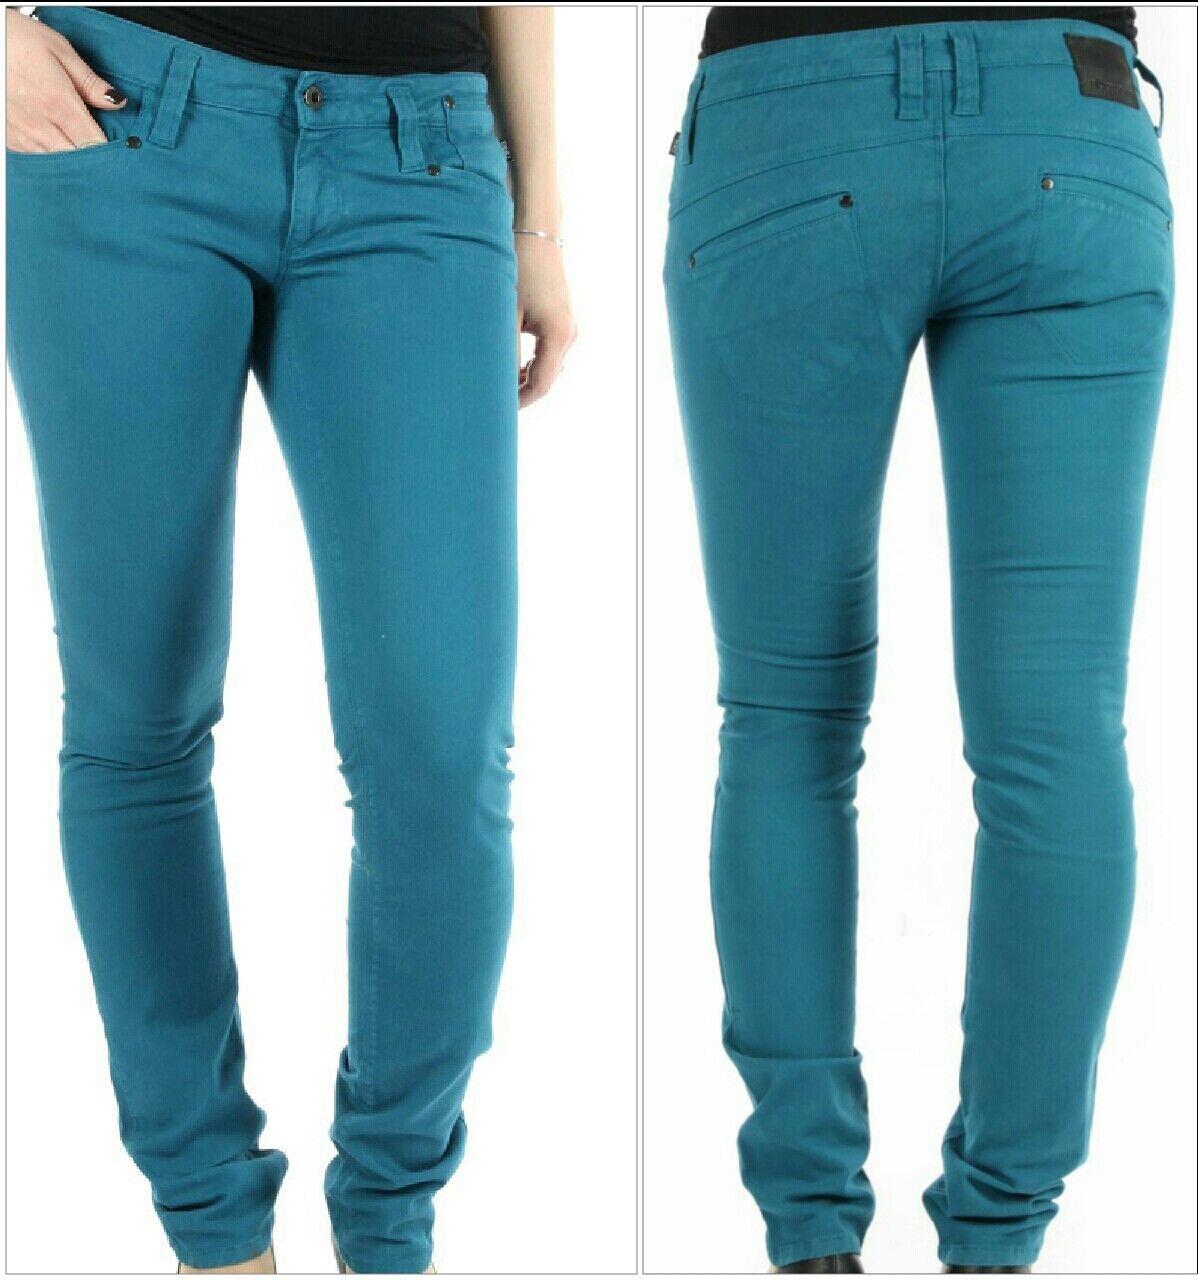 NEUF Pantalon NIKITA Isobel Damen Jeans Hose W27L32 Blau pétrole skinny original